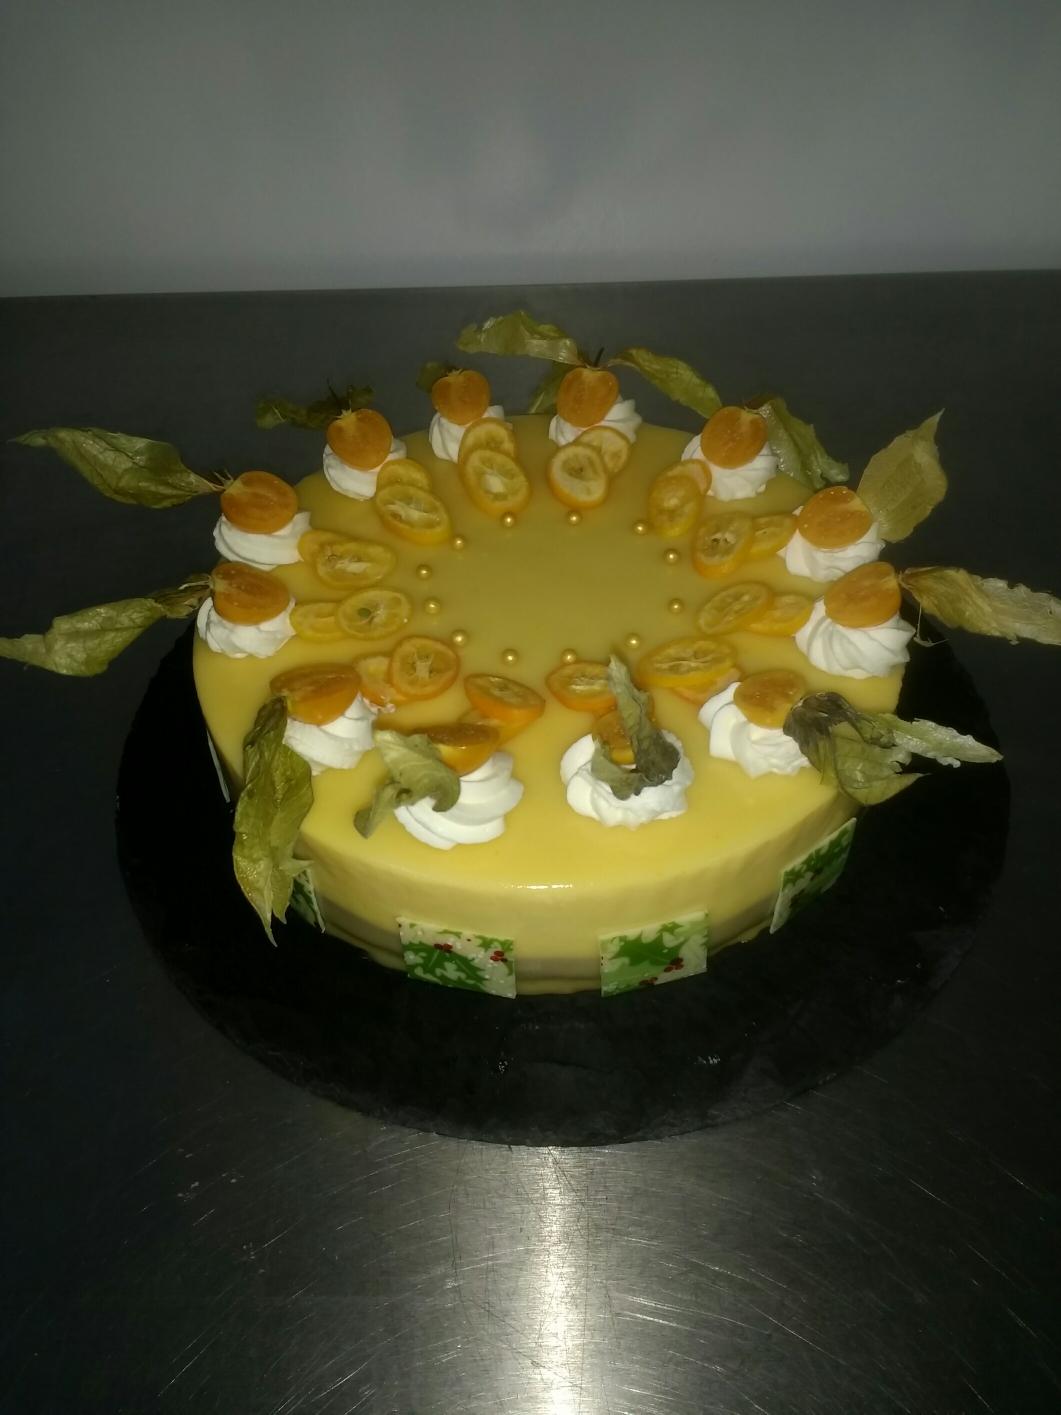 Mango Maracuja Sahne auf zartbitterer Schokoladenmousse Torte